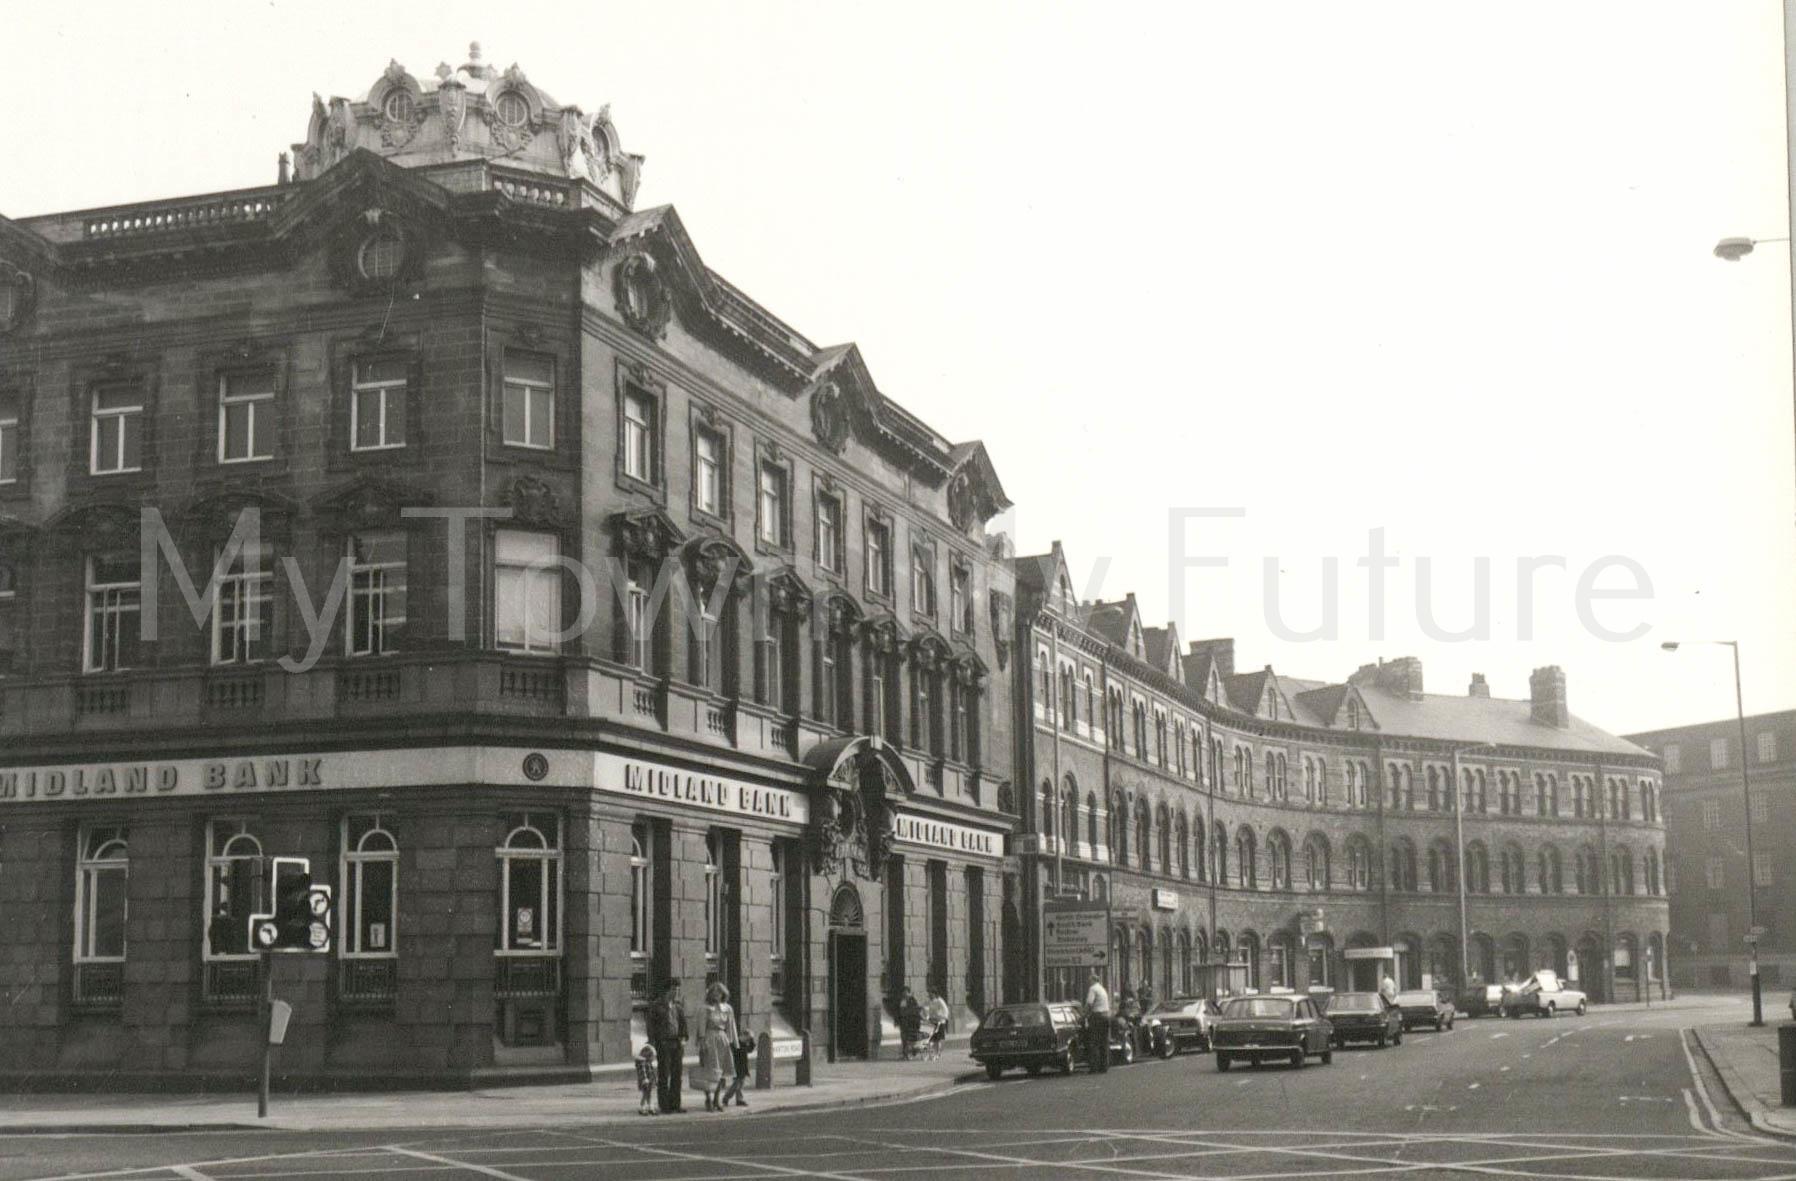 Midland Bank,Exchange Place,Marton Road